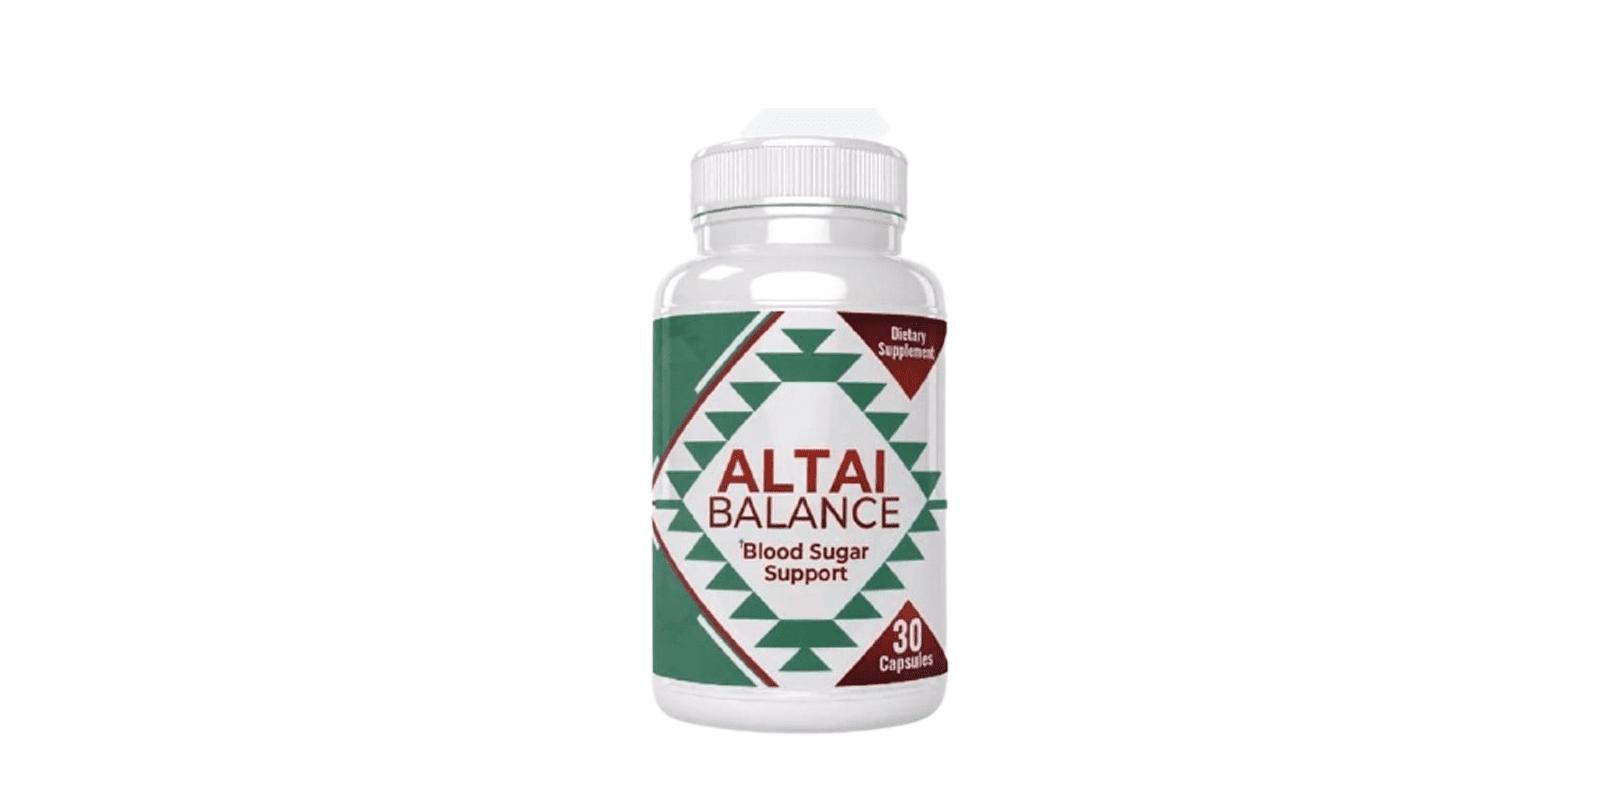 Alta Balance Reviews